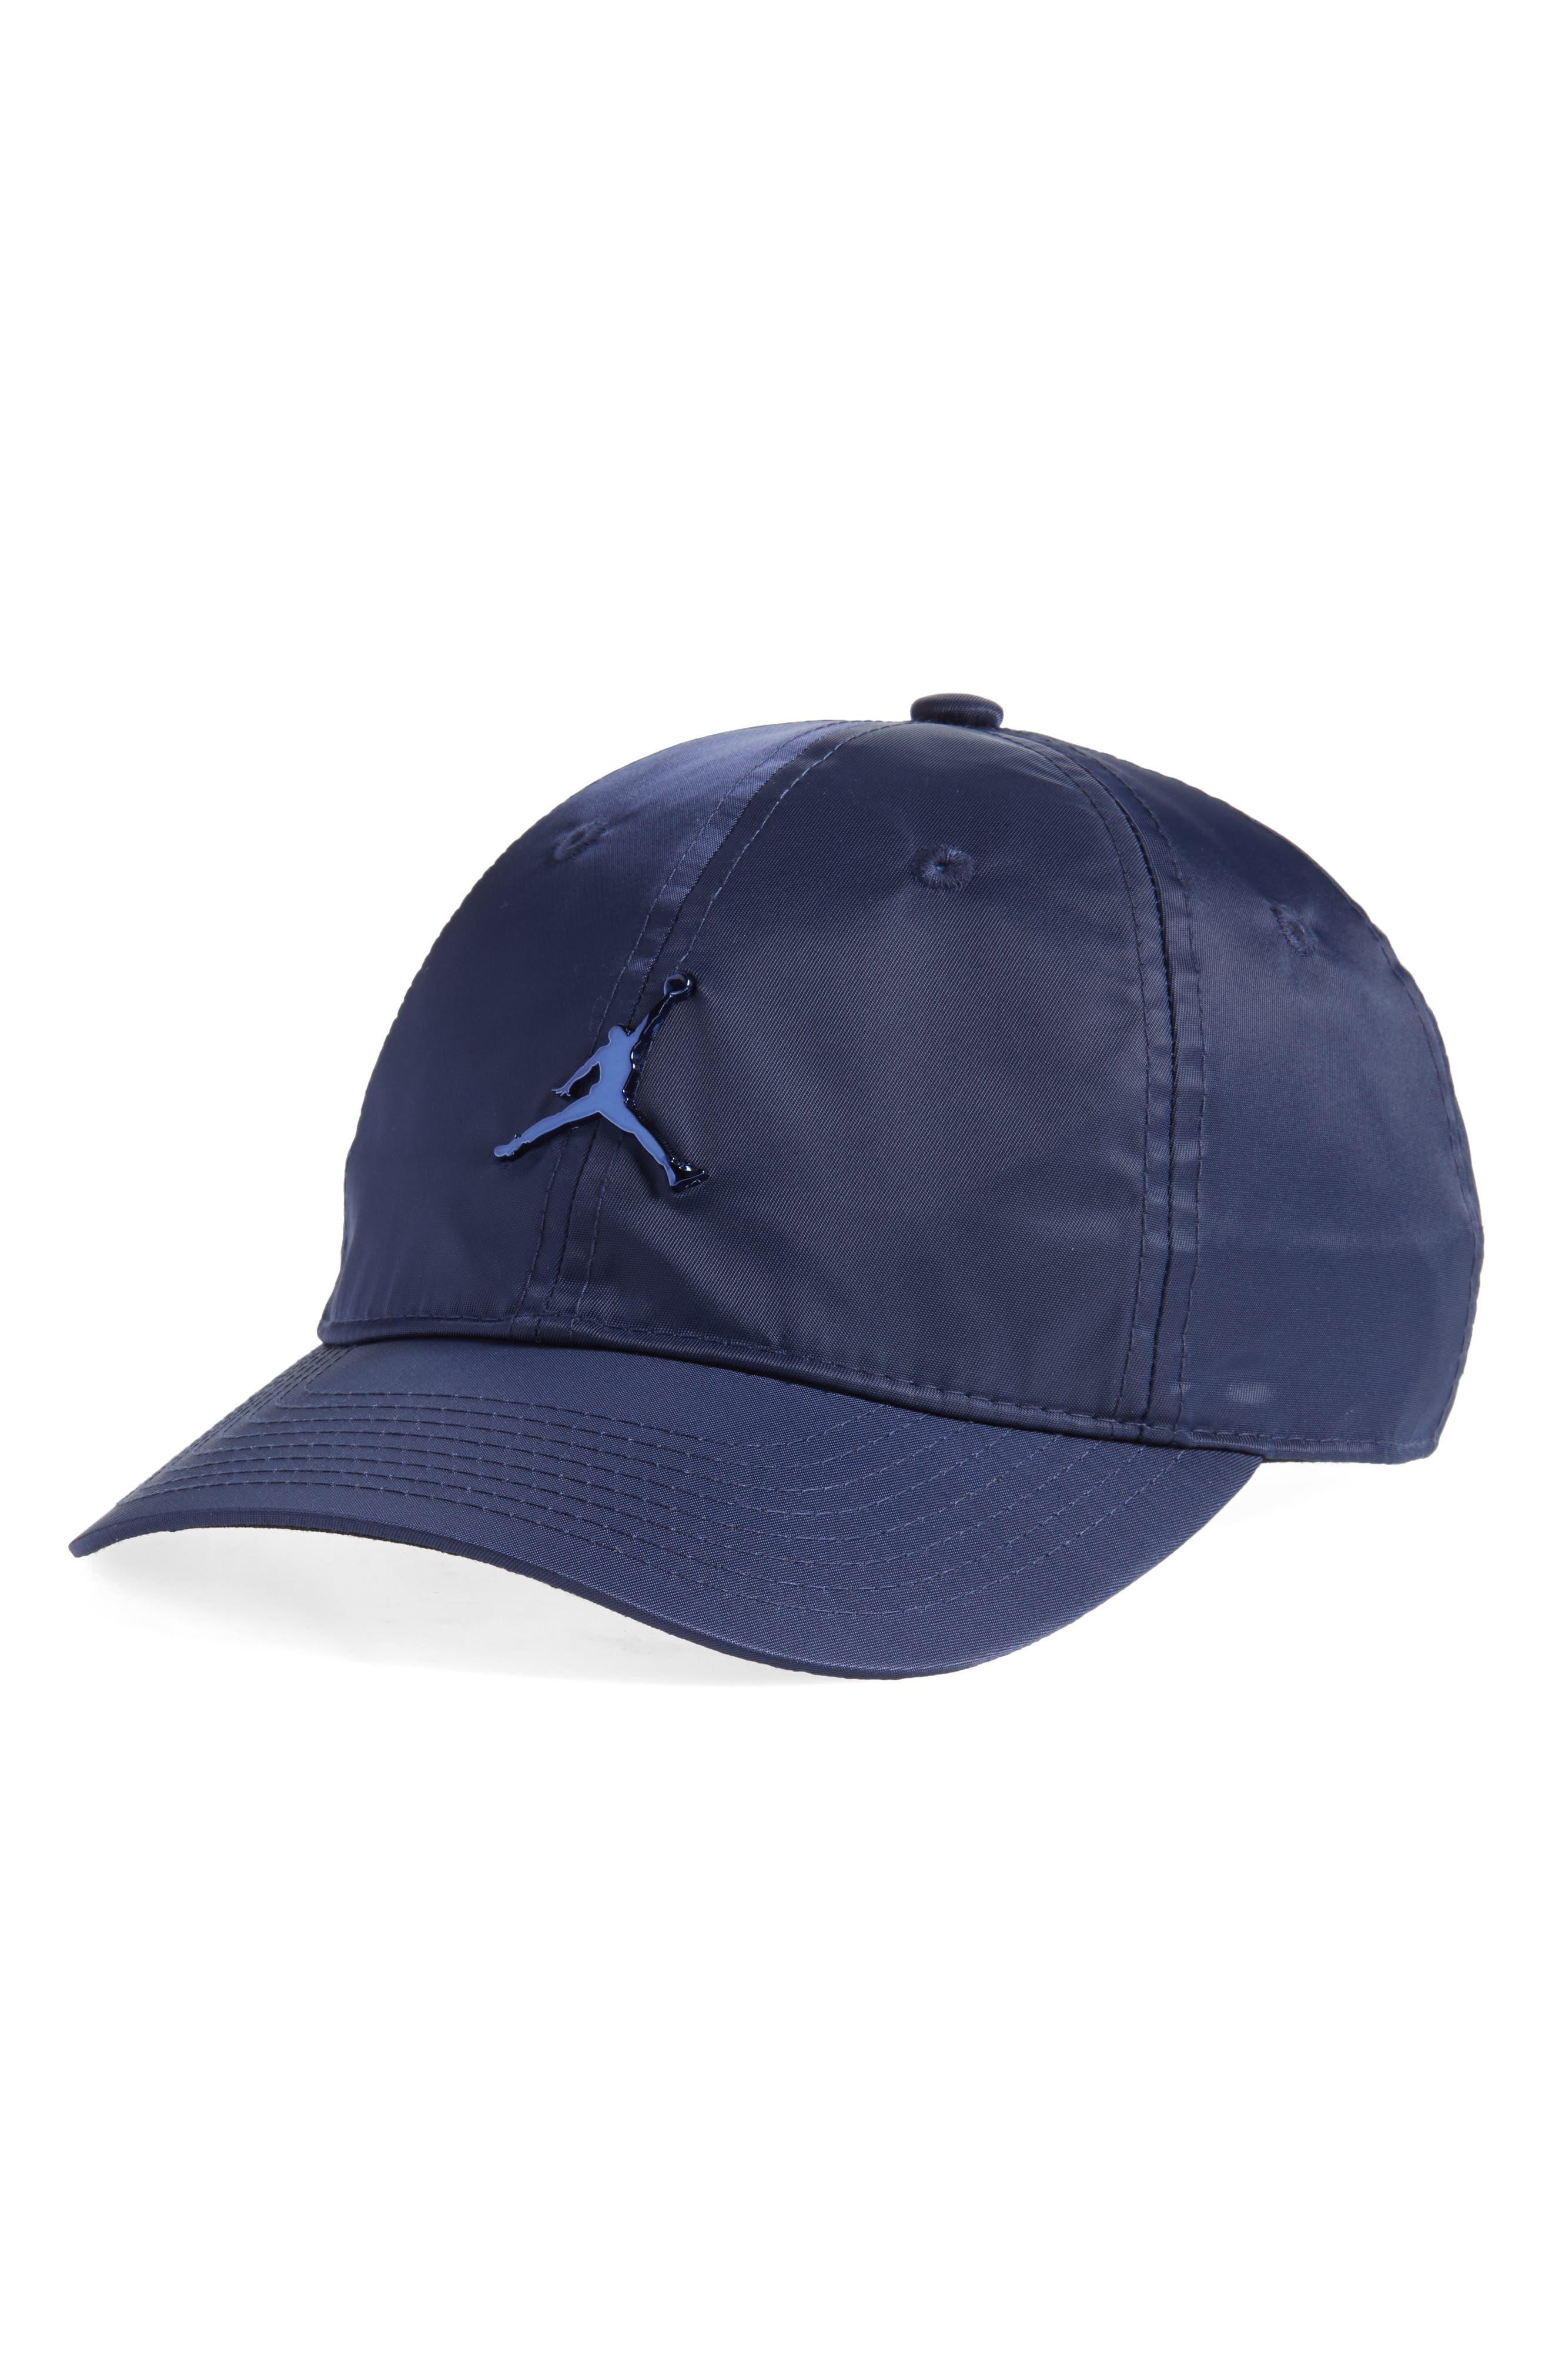 Jordan Skyline Flights Cap (Boys)